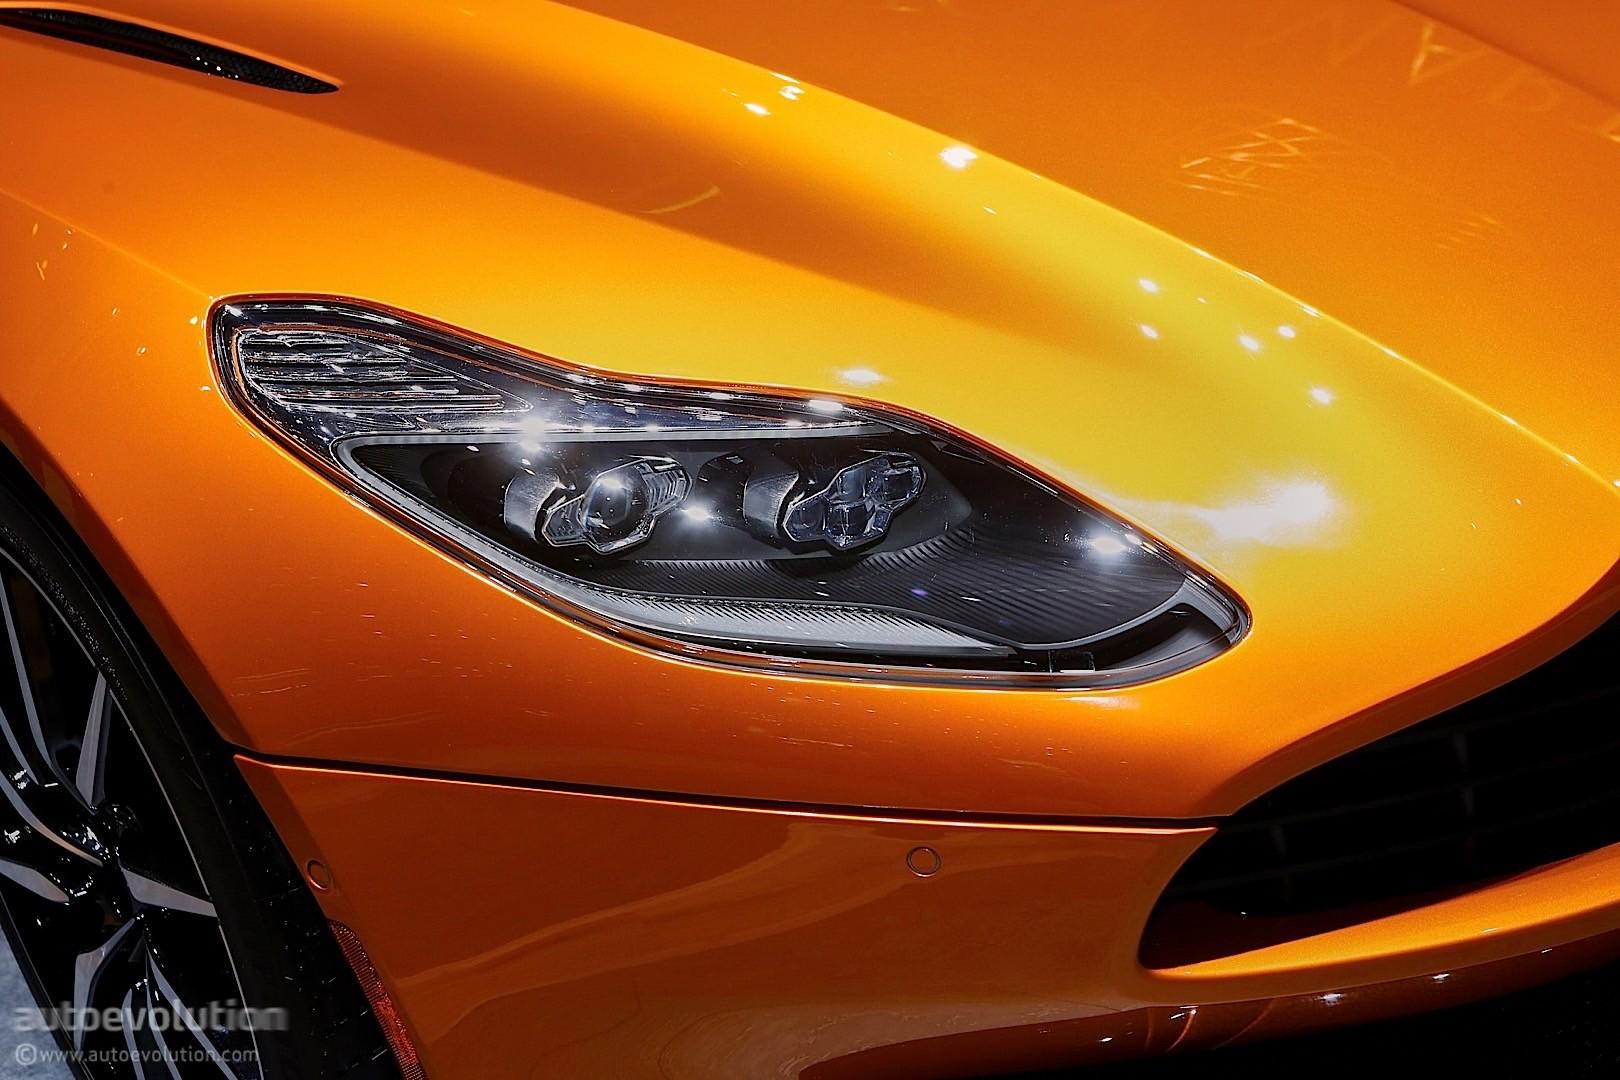 aston martin db11 racecar with vulcan headlights rendering surfaces